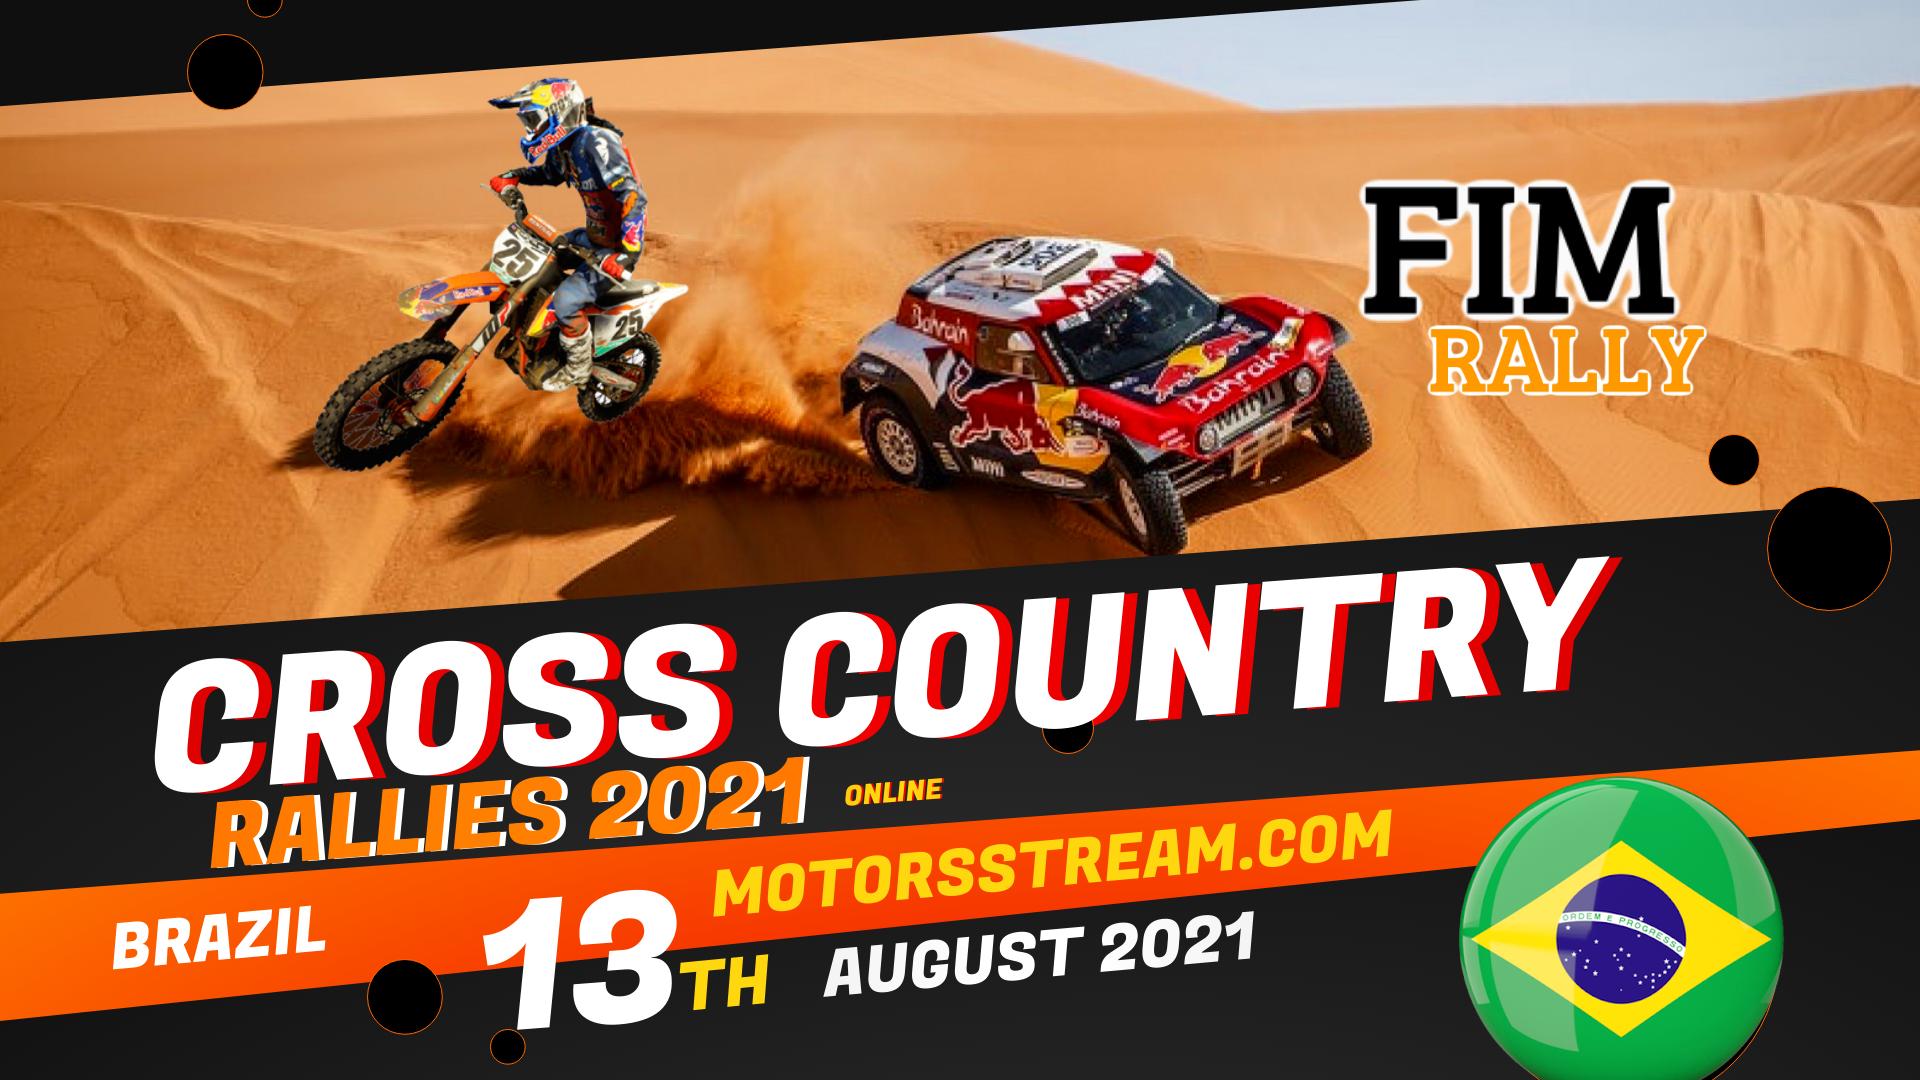 Brazil Cross Country Rallies Live Stream 2021